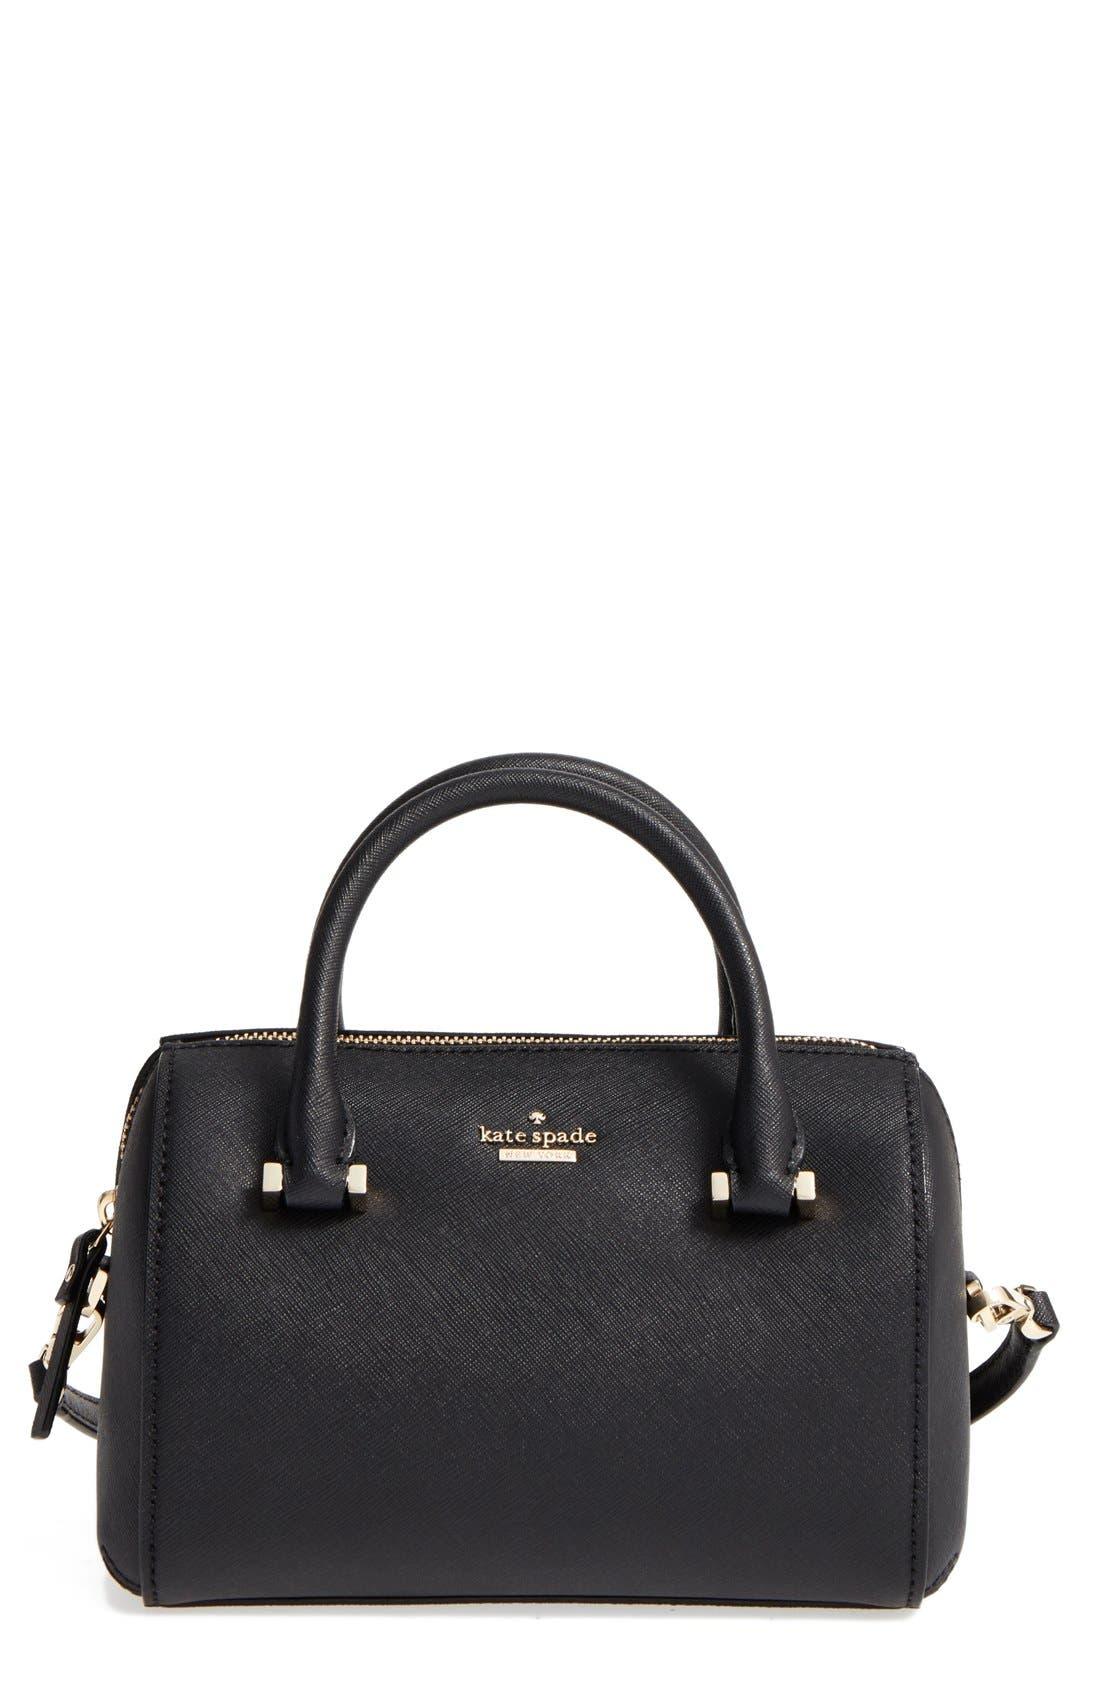 cameron street lane leather satchel,                             Main thumbnail 1, color,                             001